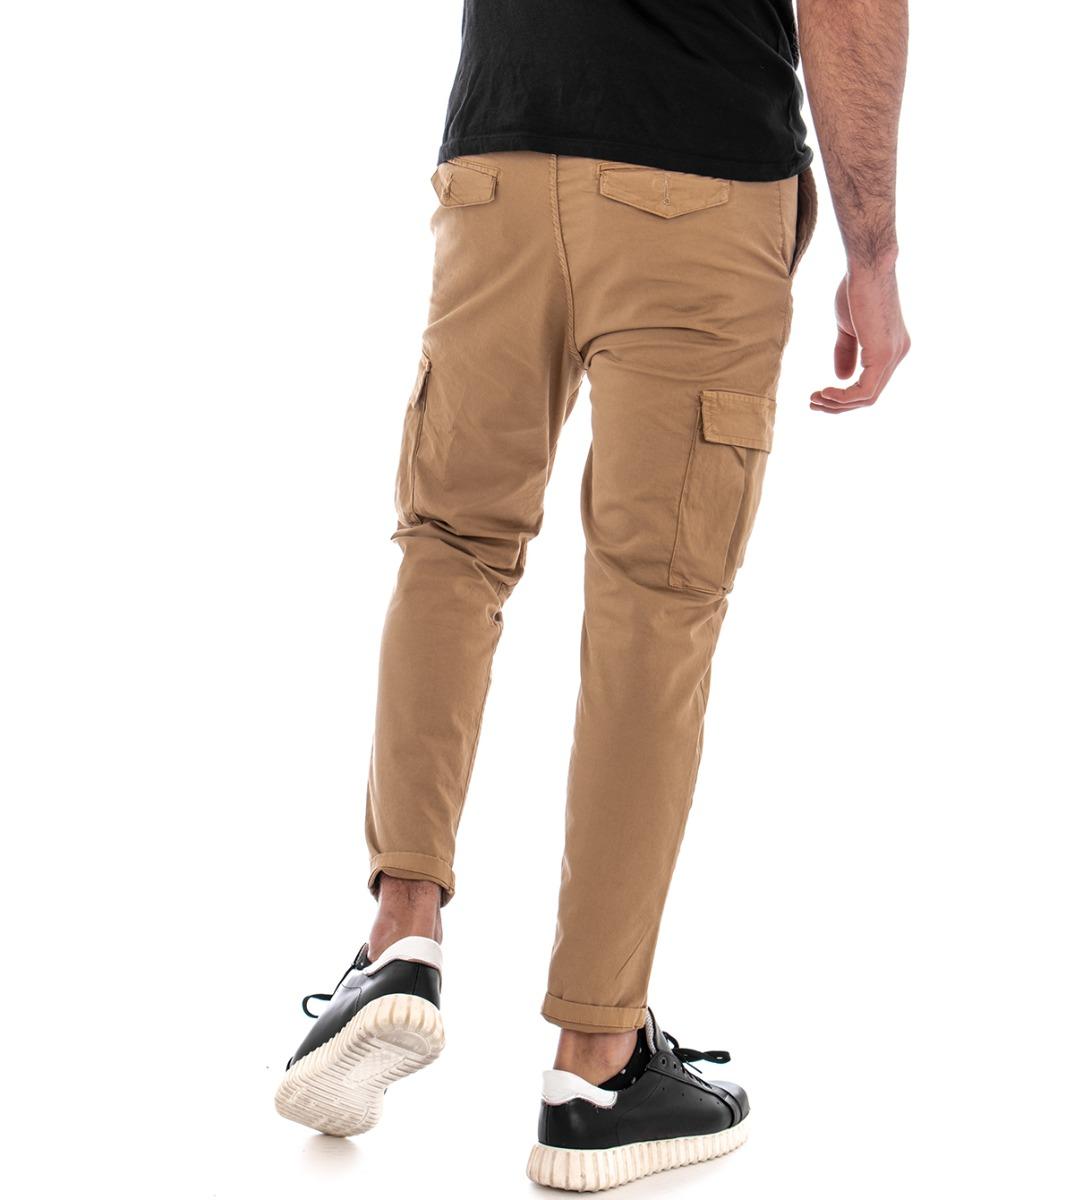 Pantalone-Uomo-Cargo-Tasca-America-Kaki-Tinta-Unita-Cotone-Casual-GIOSAL miniatura 4